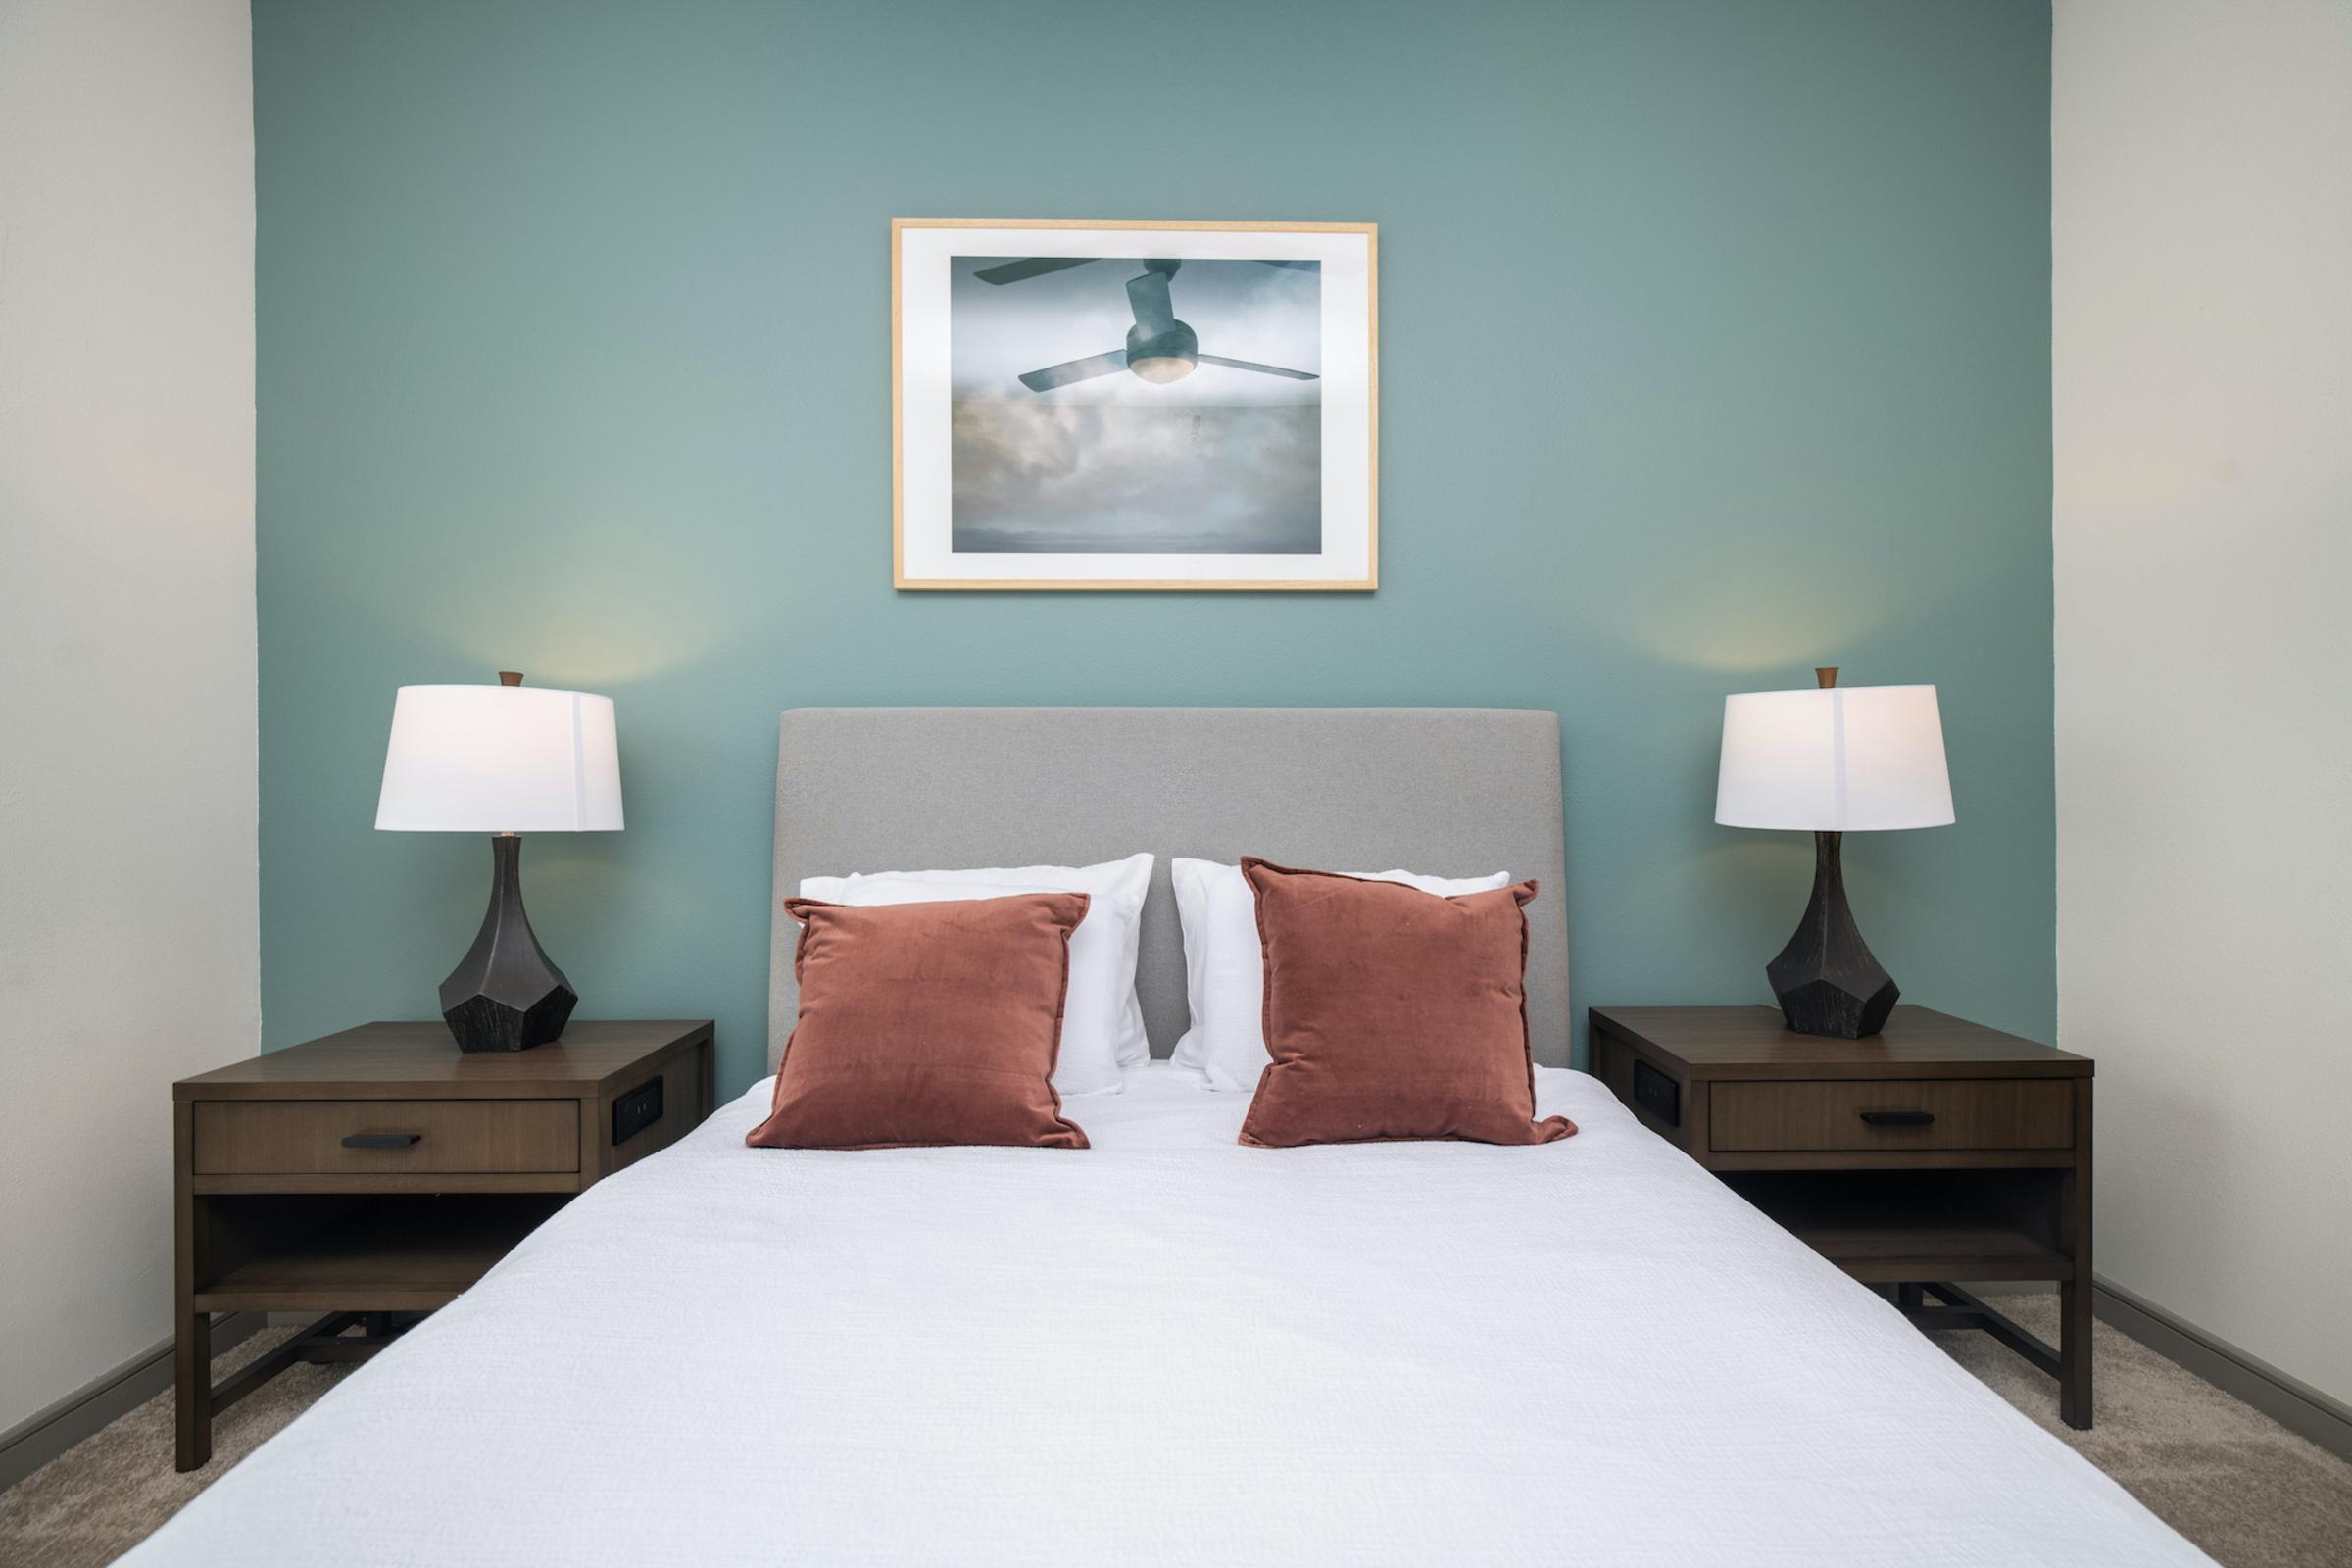 Imagine Apartments 2306 for rent